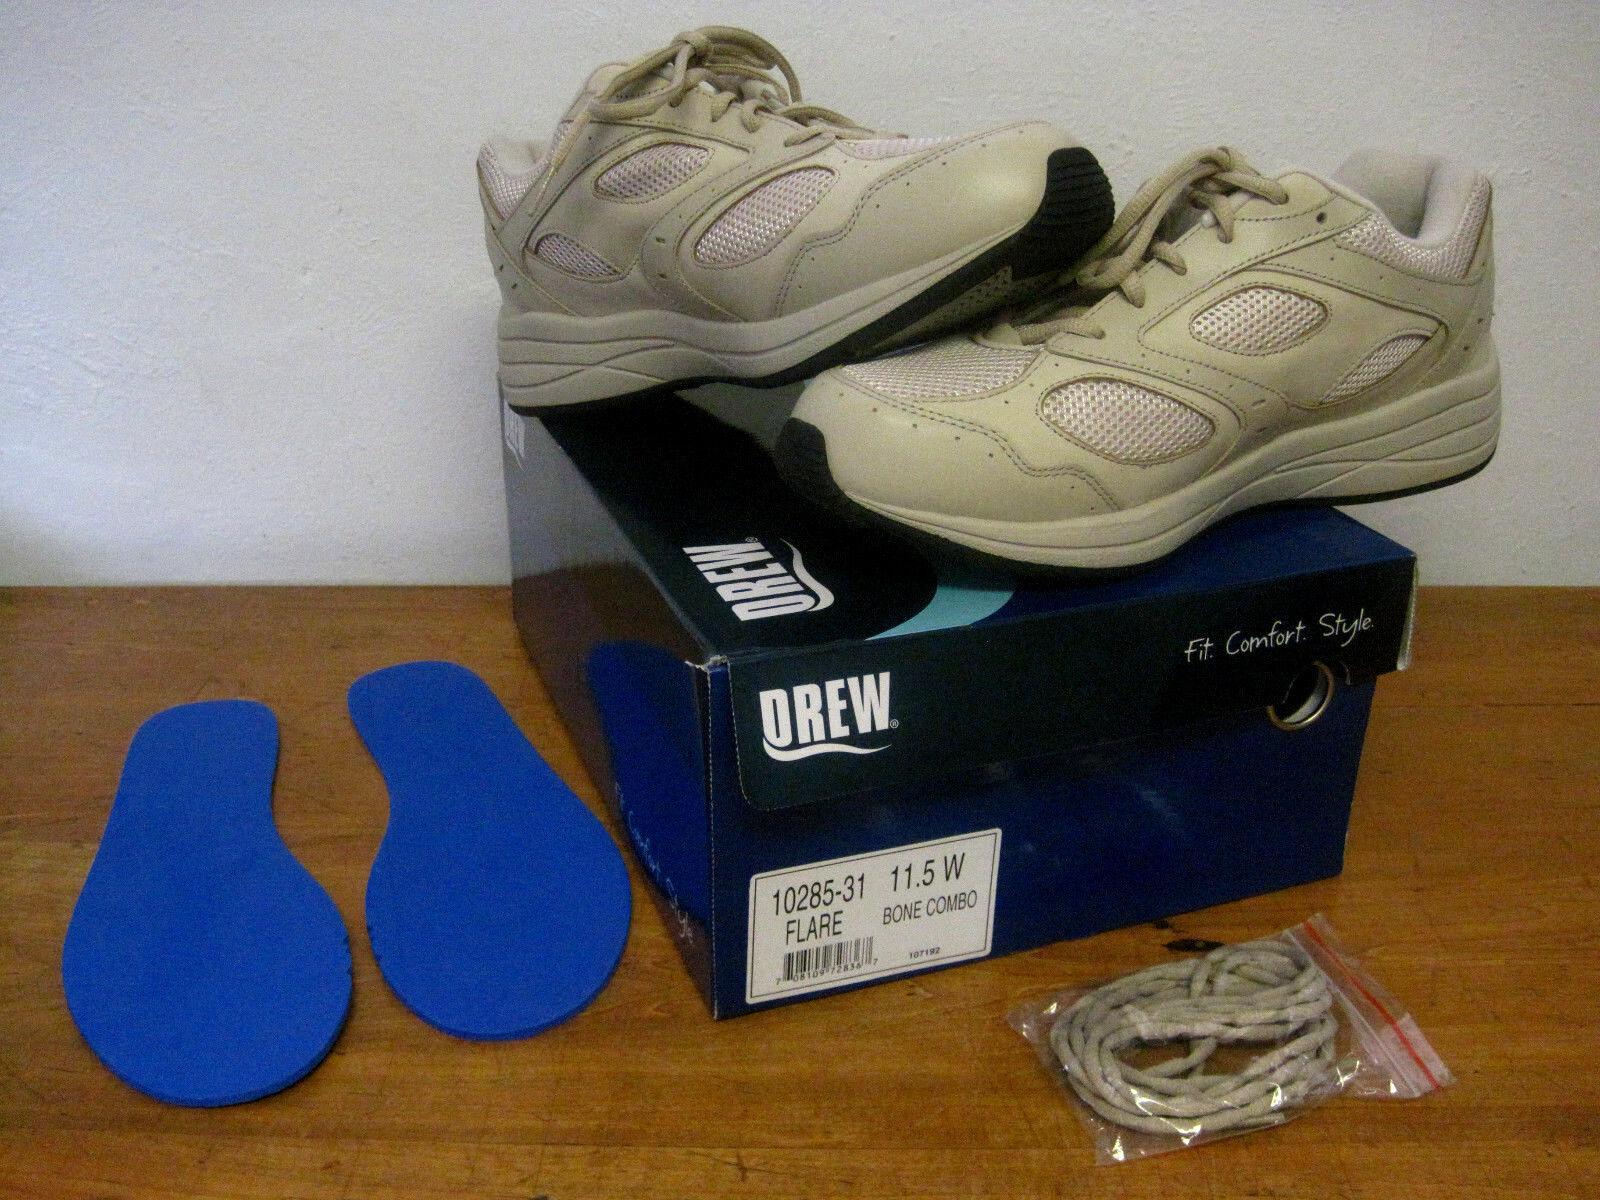 NEW Women's DREW Flare Bone Combo 10285-31 Leather Orthotics Sneakers Sz 11.5 W